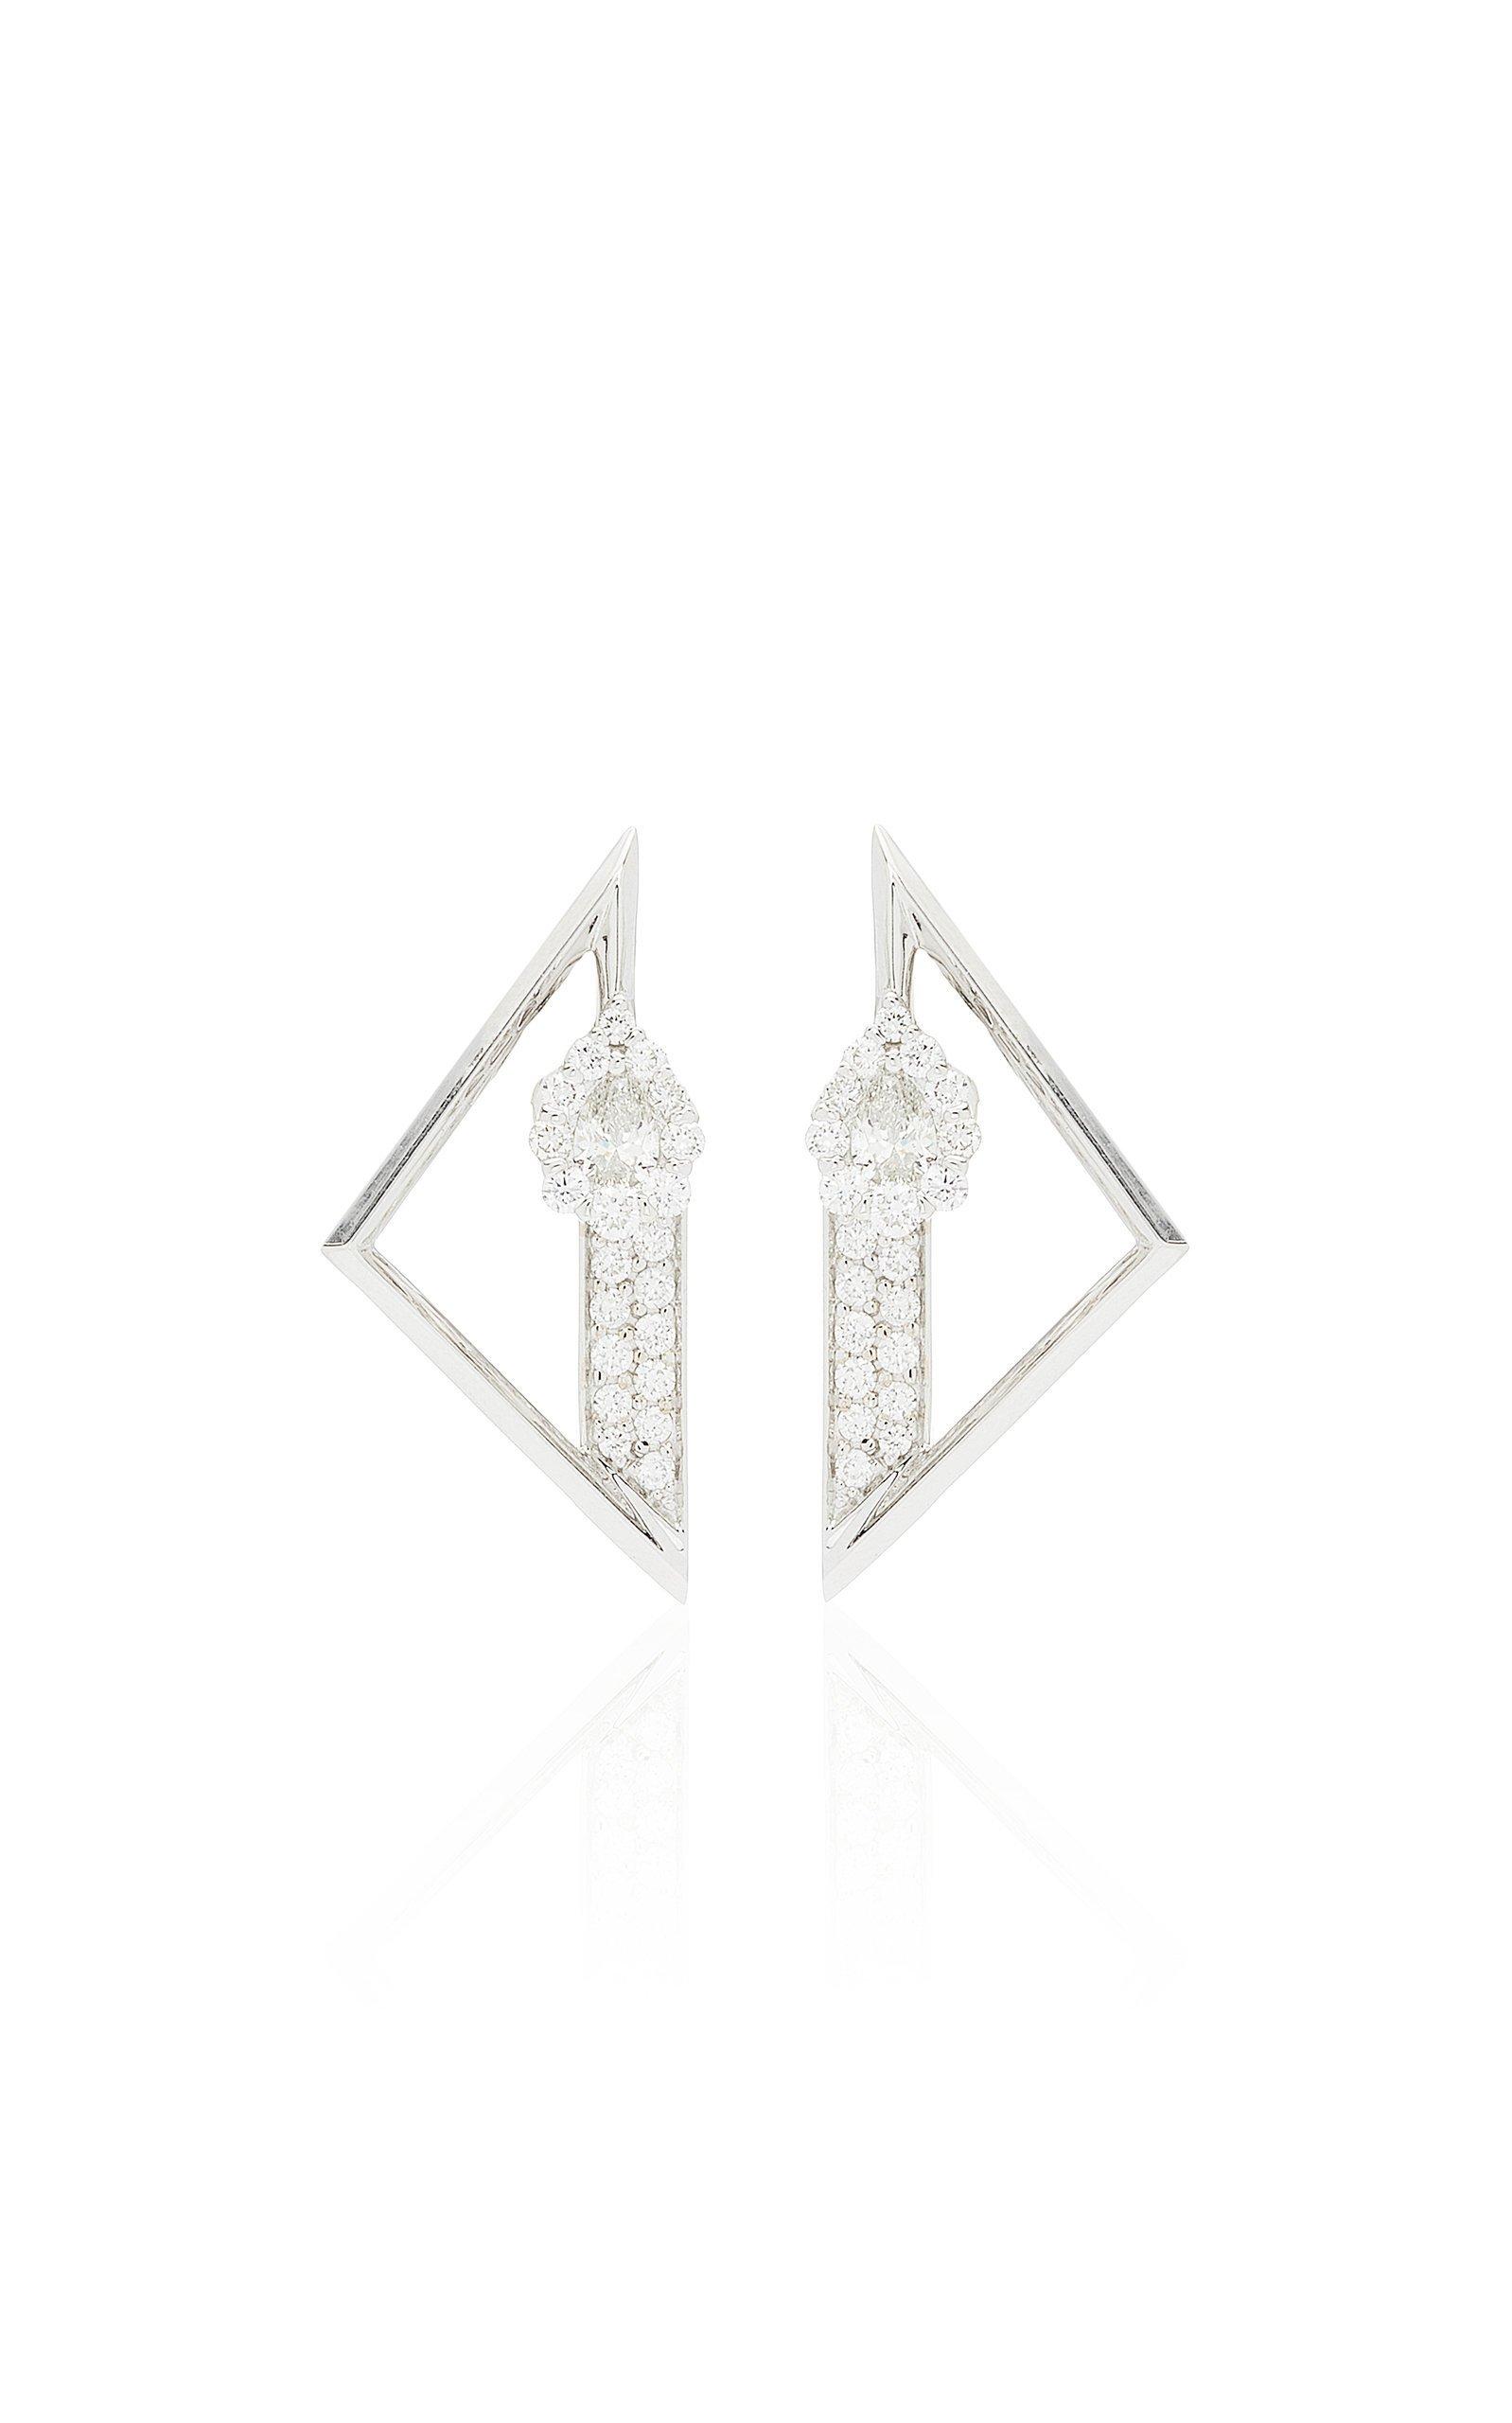 Yeprem 18K White Gold Electrified Earrings